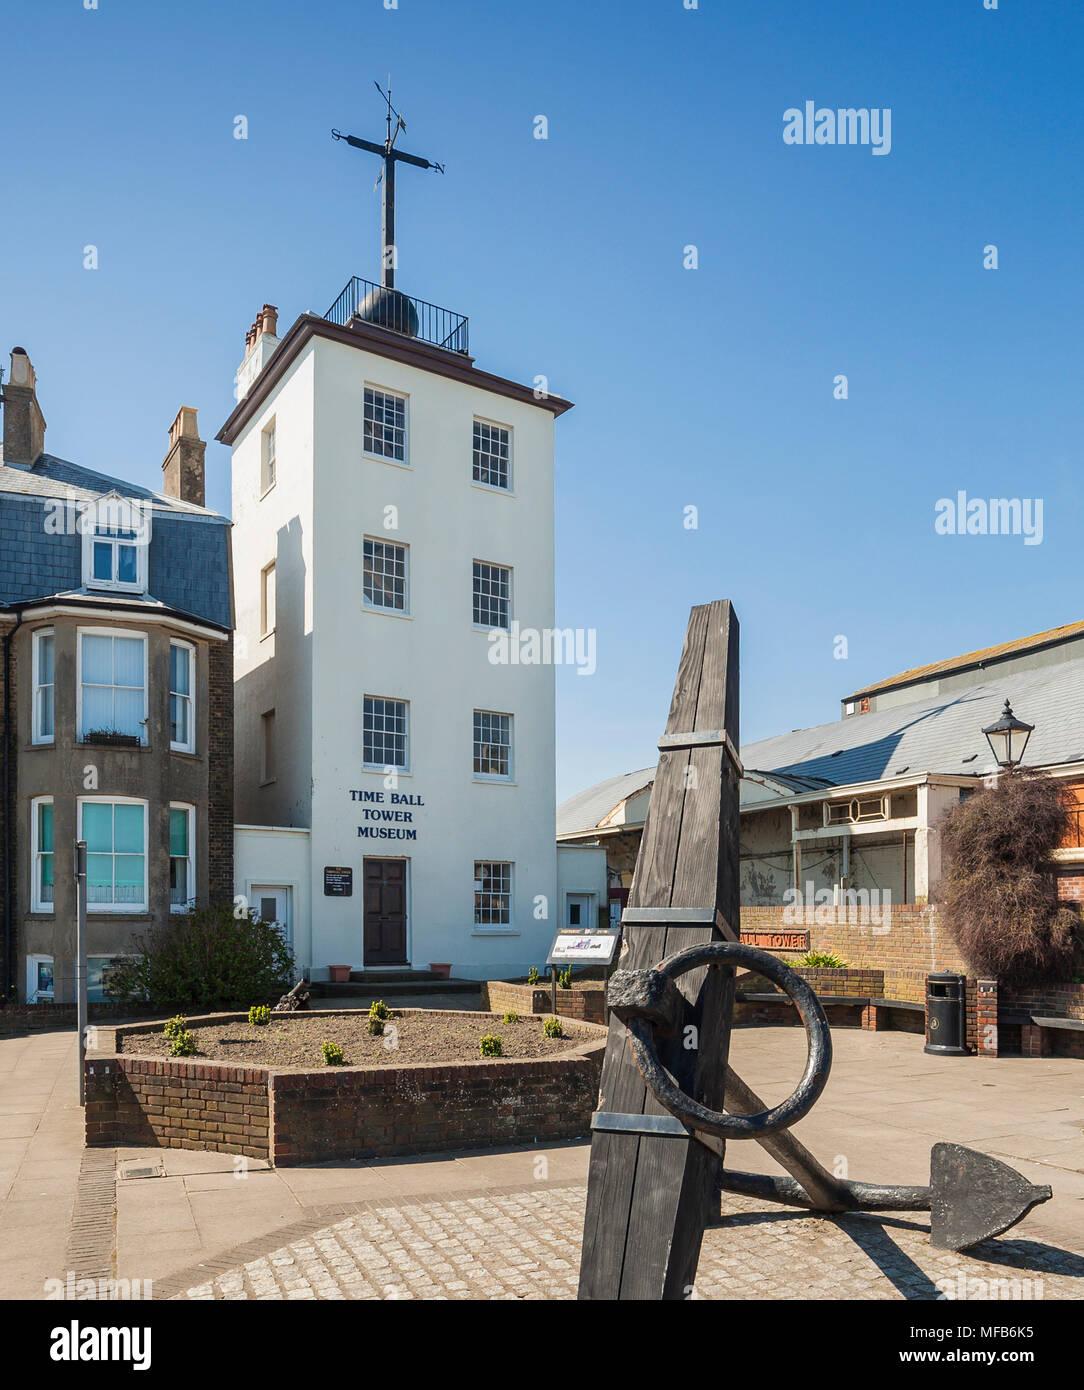 El Museo de la torre de bolas, tratar, Kent. Imagen De Stock